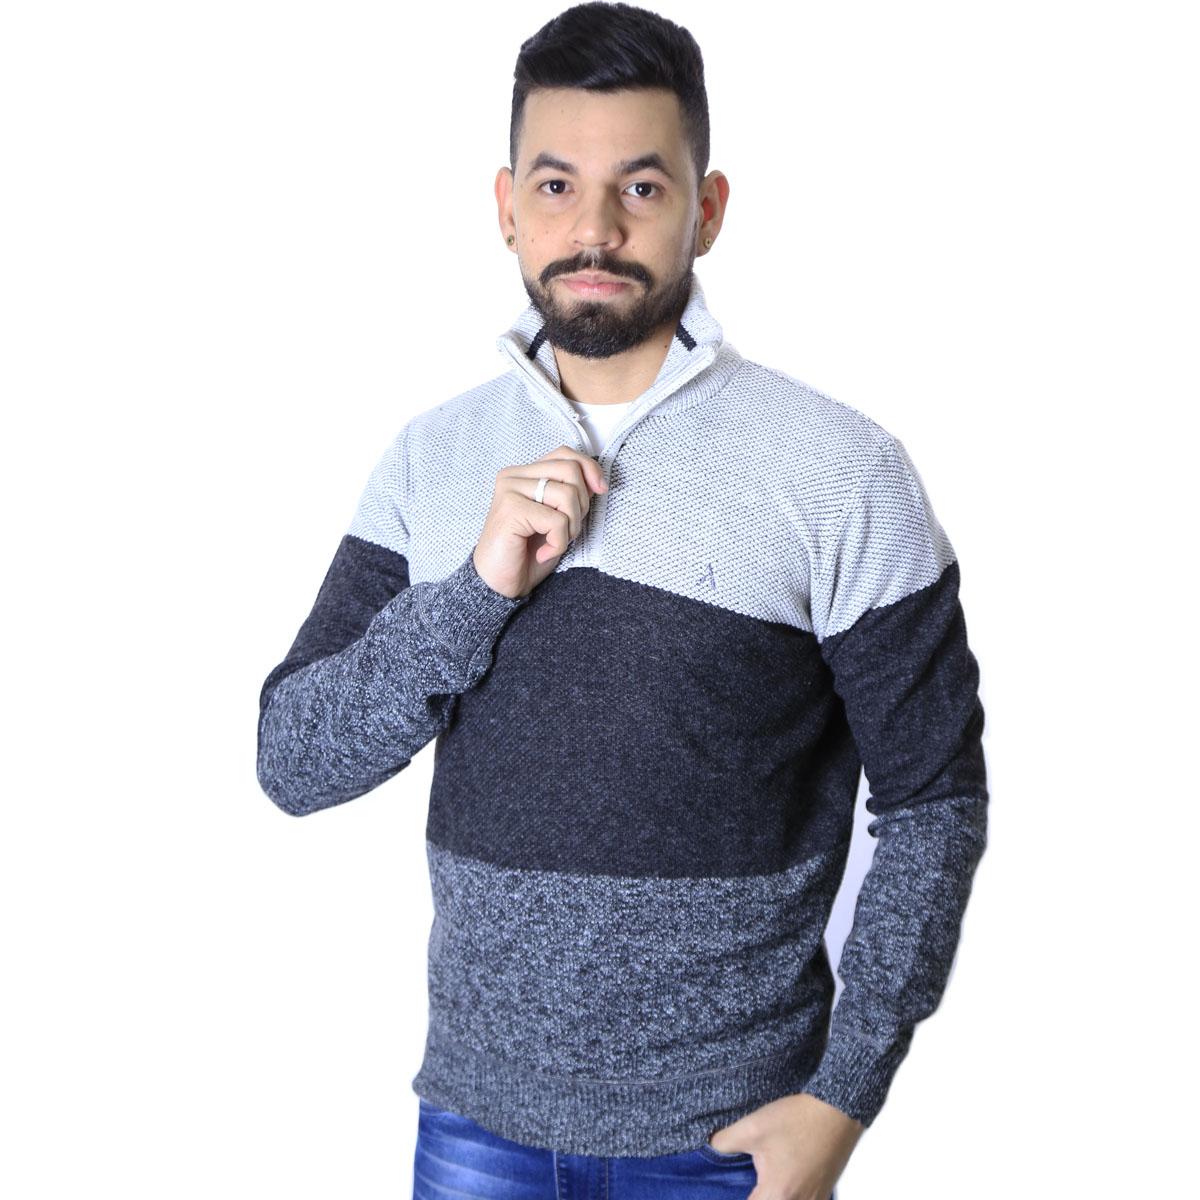 Suéter Agricio Meio Ziper Listra Cinza Mescla